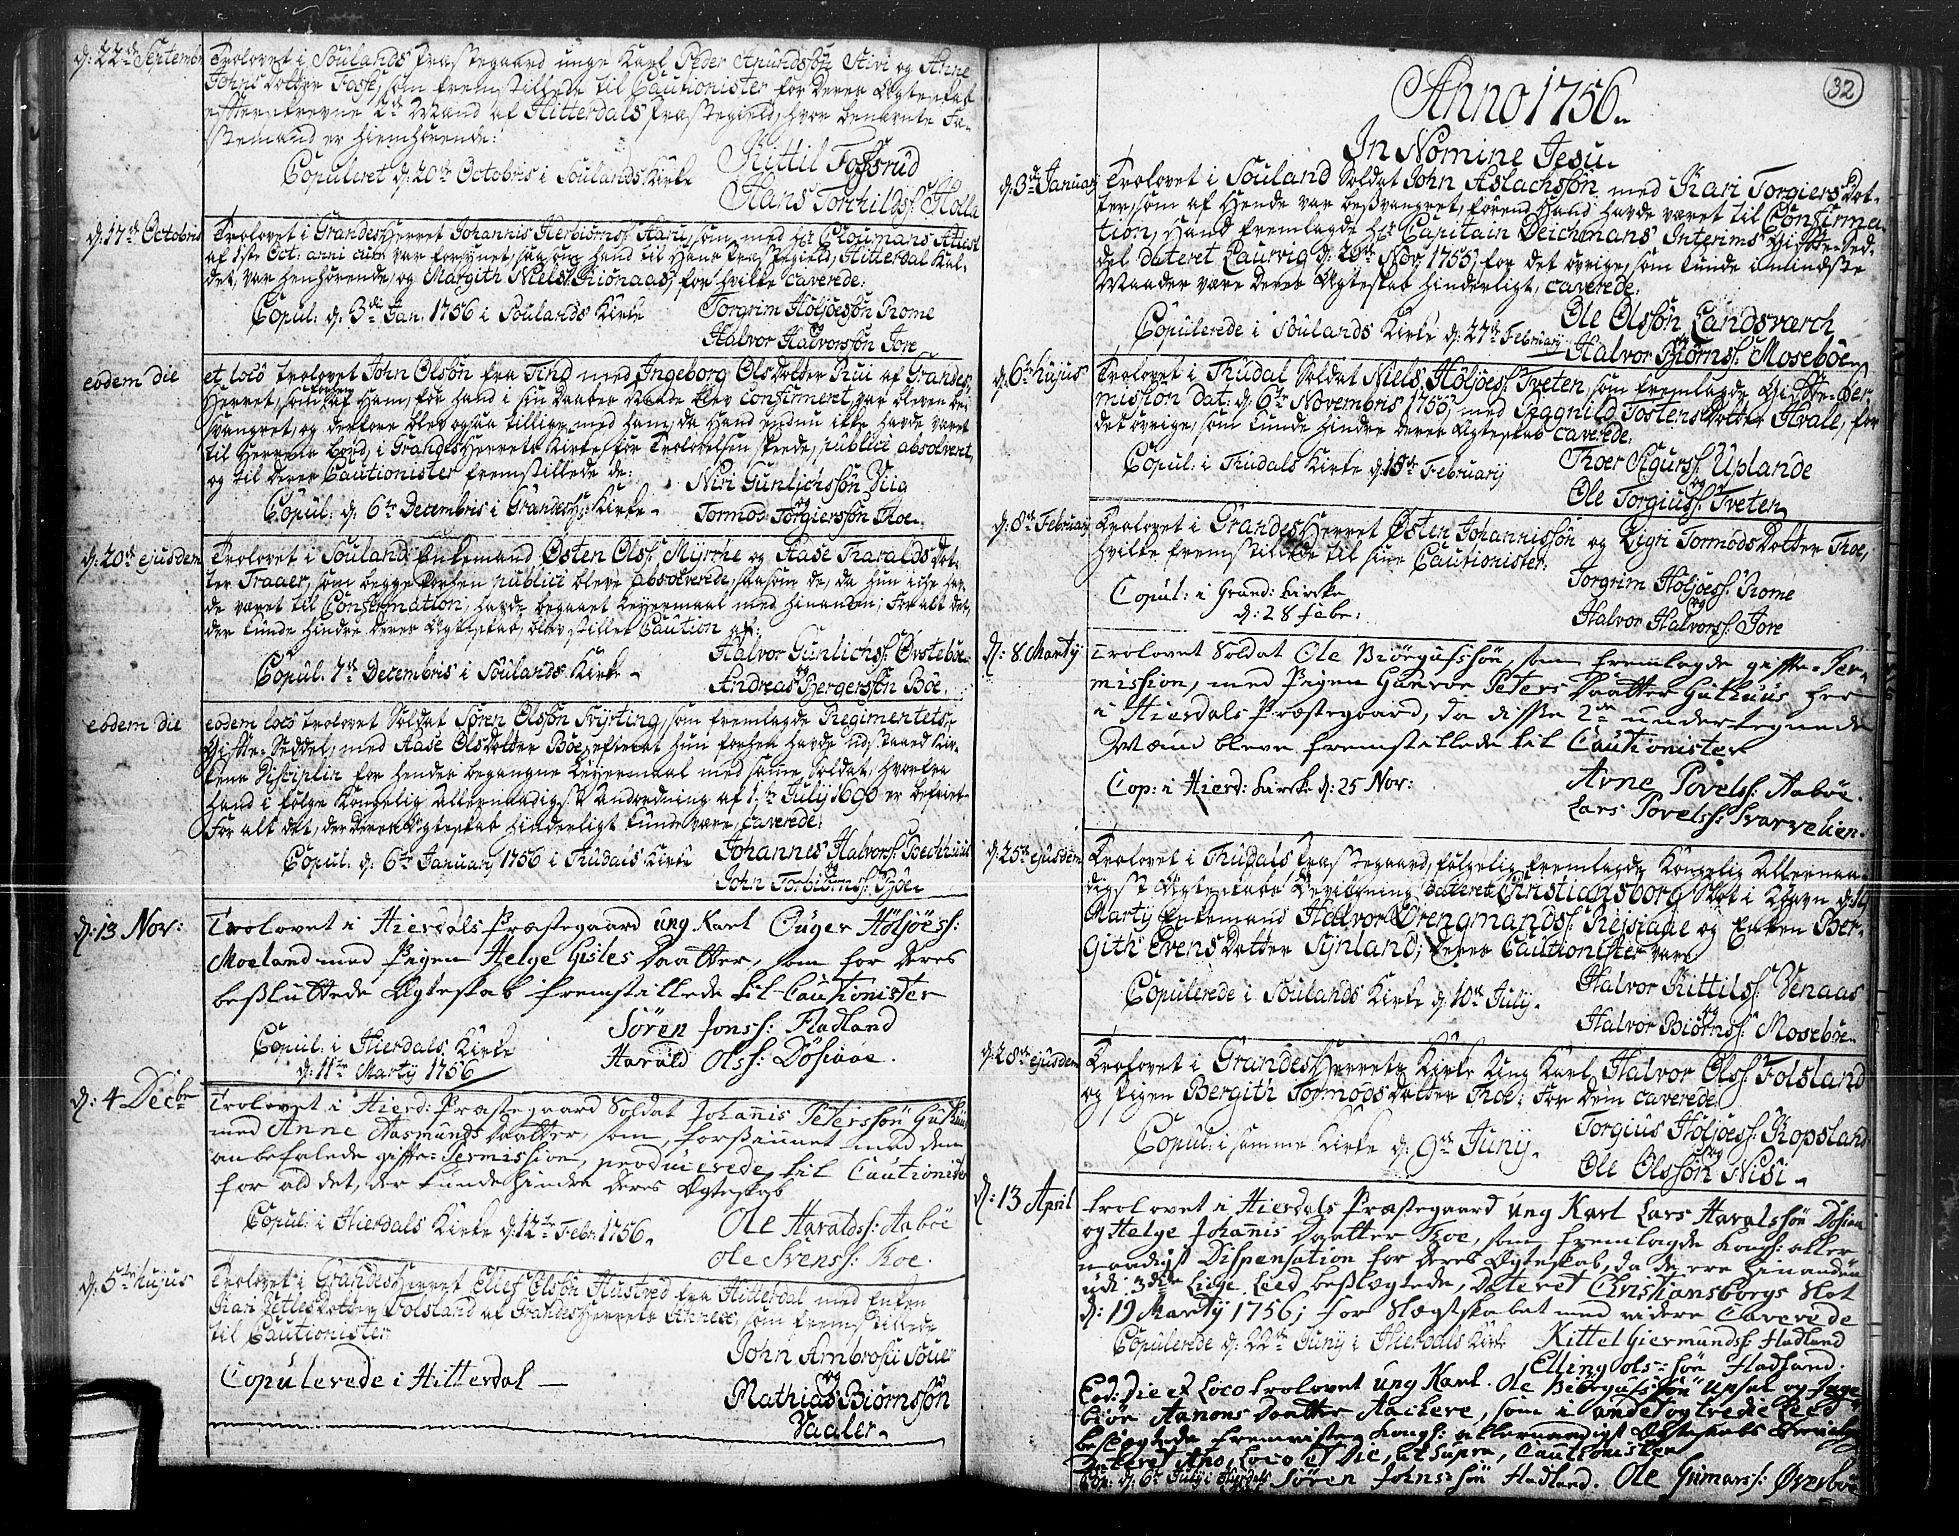 SAKO, Hjartdal kirkebøker, F/Fa/L0004: Ministerialbok nr. I 4, 1727-1795, s. 32